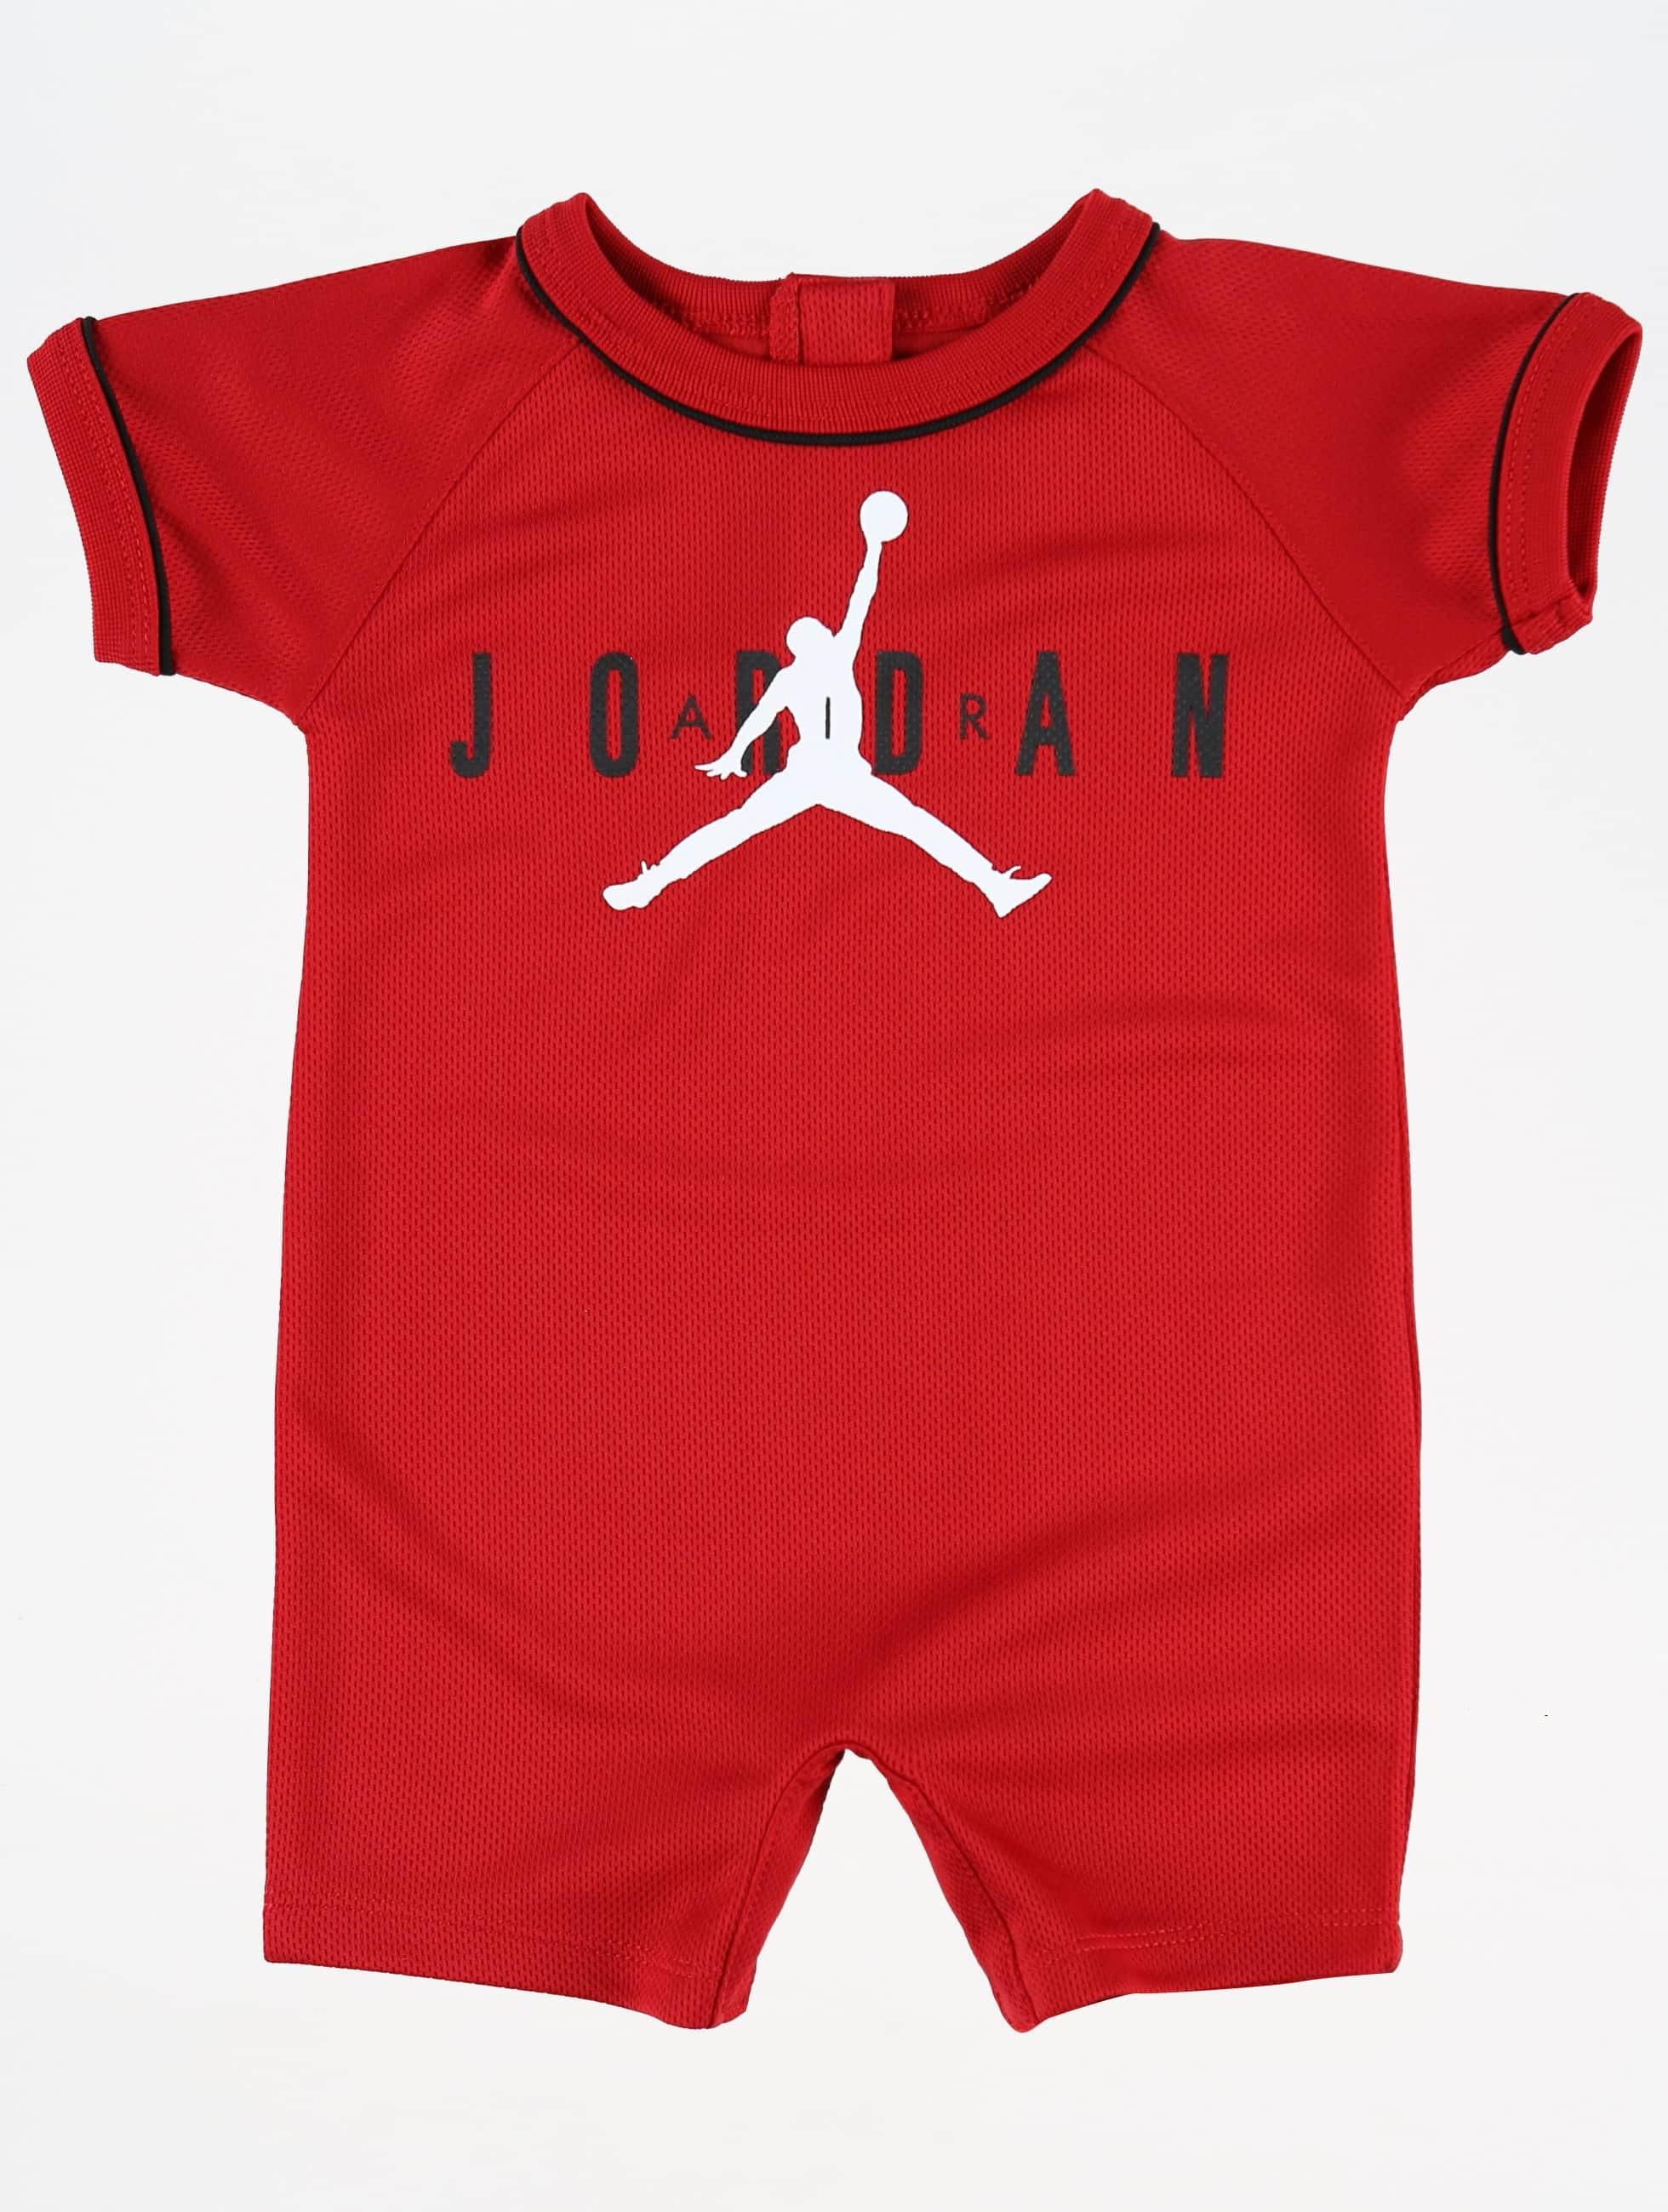 Jordan | Jumpman rouge Enfant Body